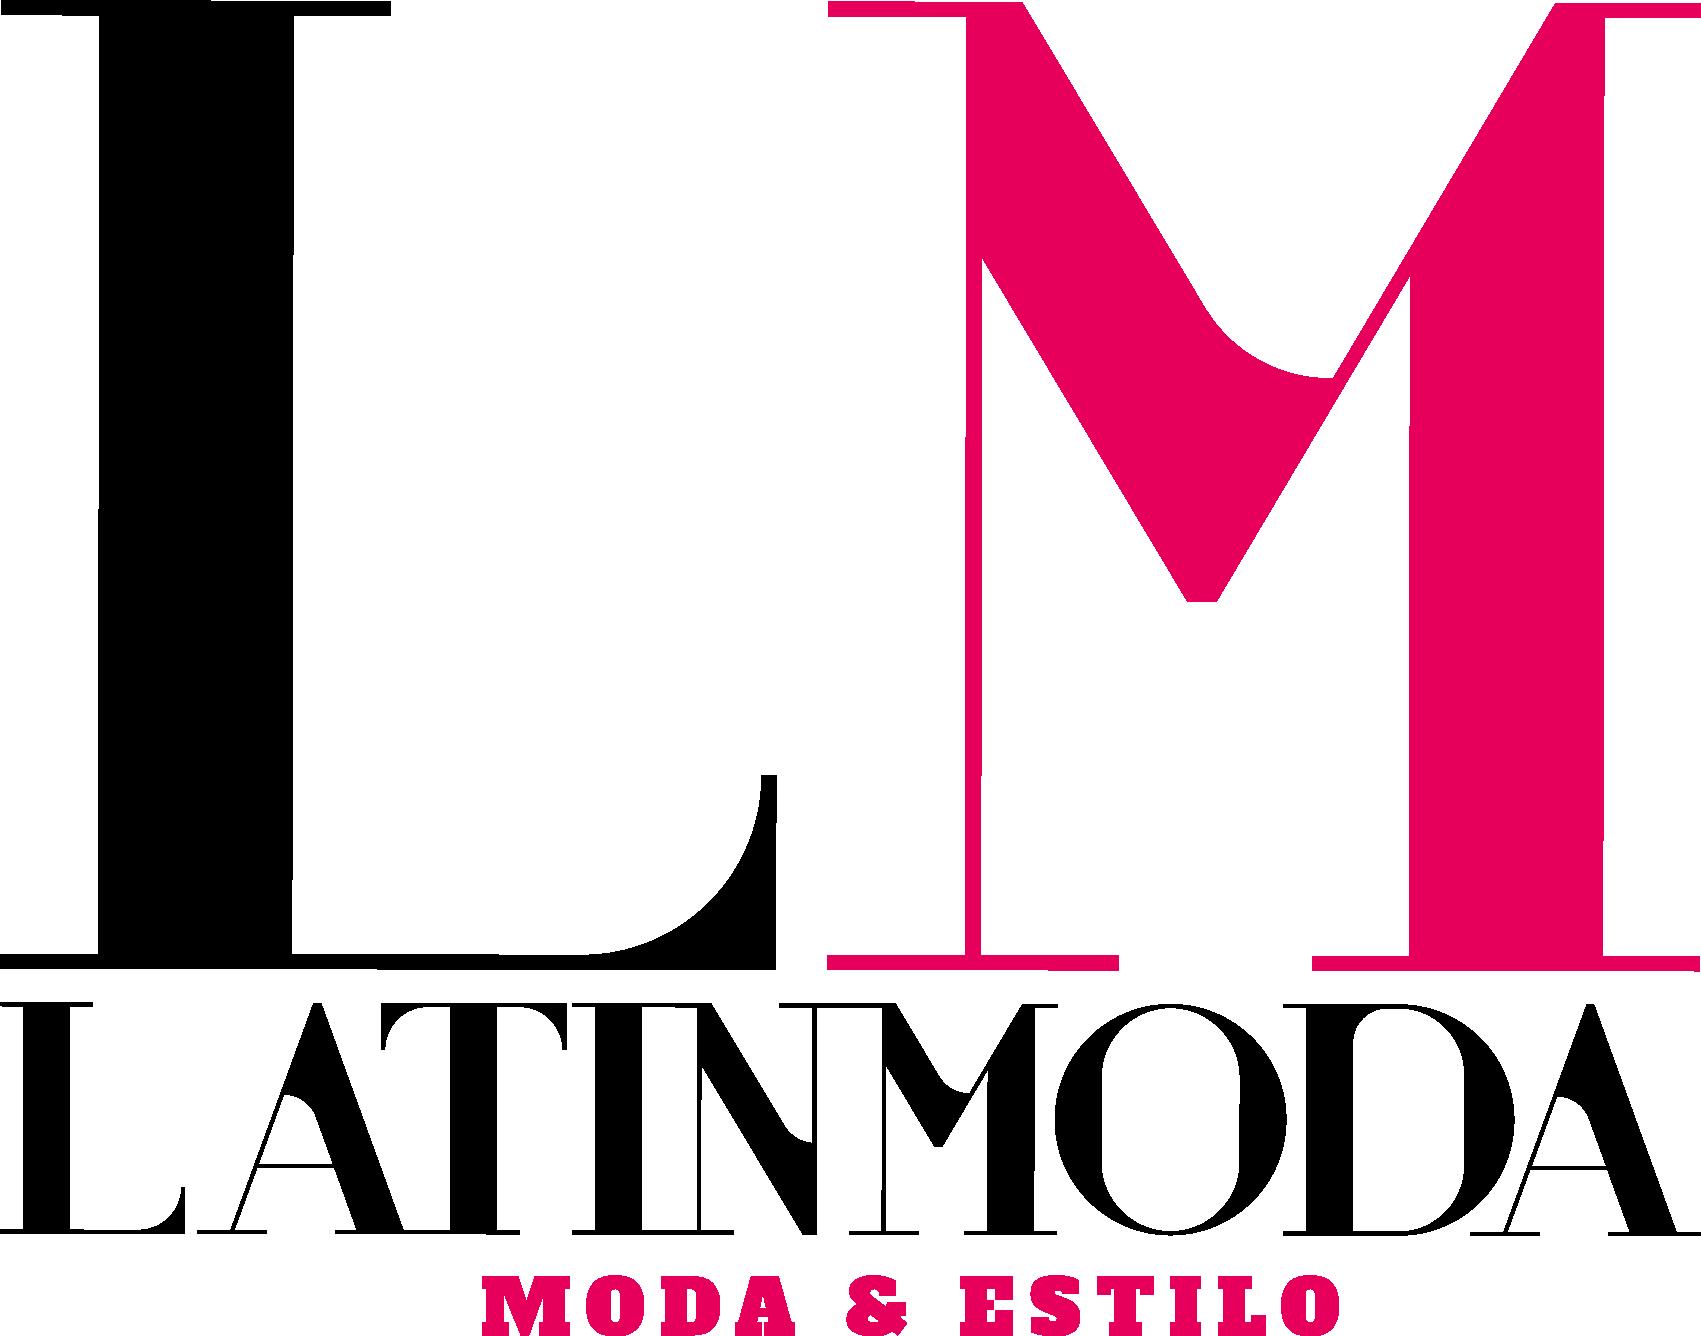 Logo Latin Moda ccaa4811af81